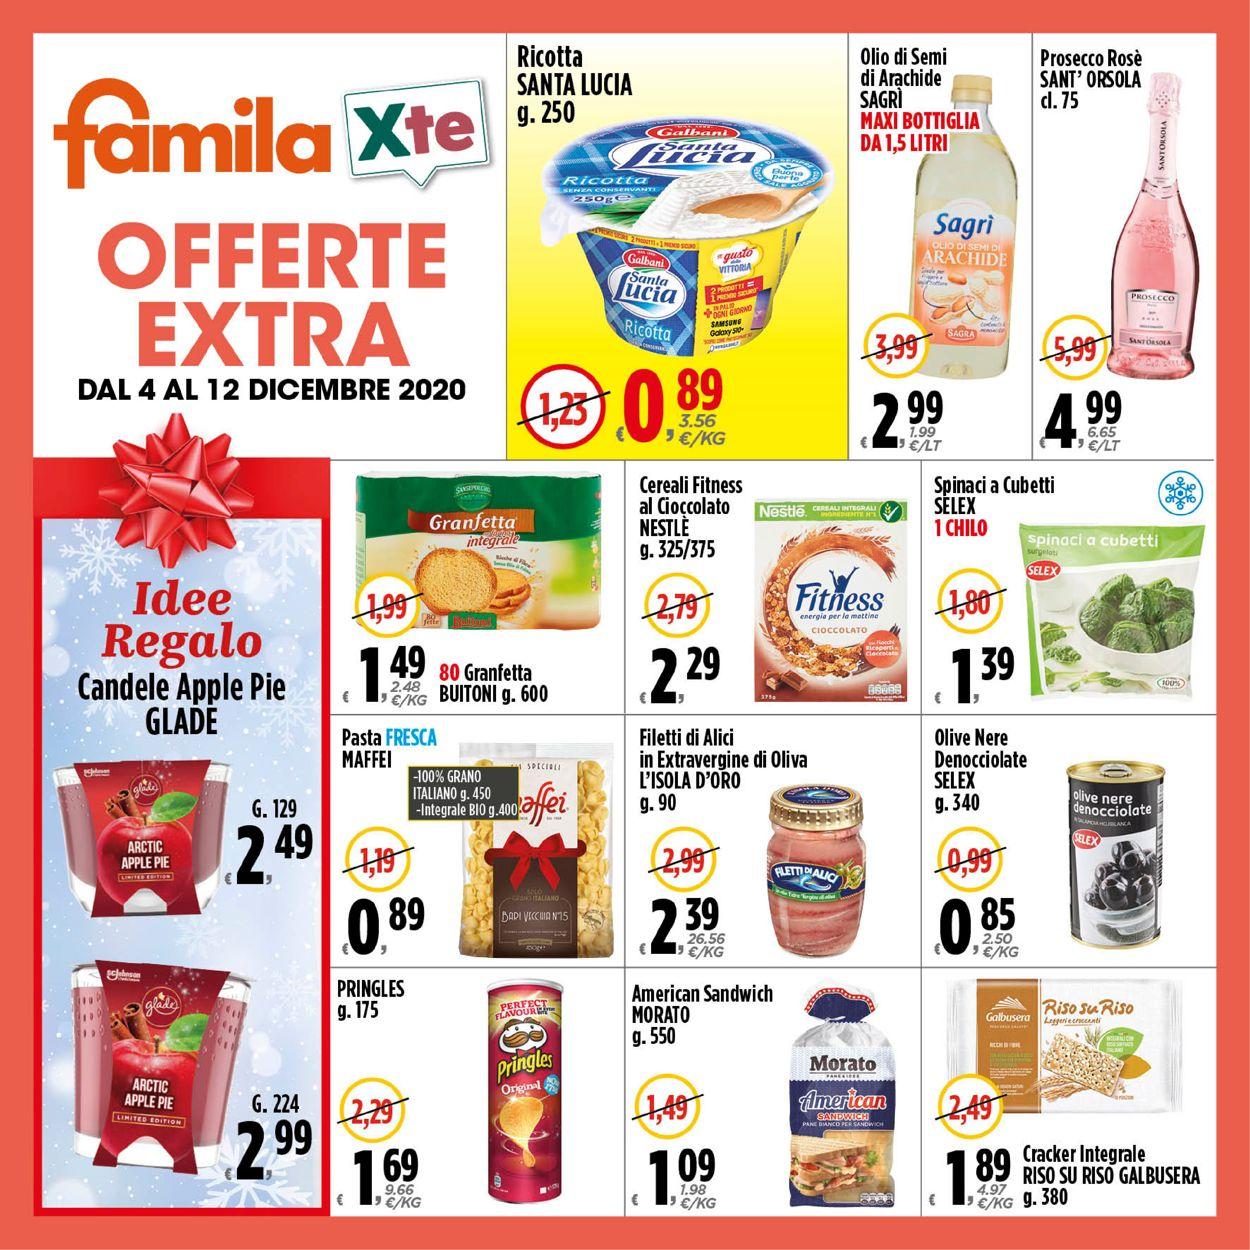 Volantino Famila - Natale 2020 - Offerte 04/12-12/12/2020 (Pagina 2)